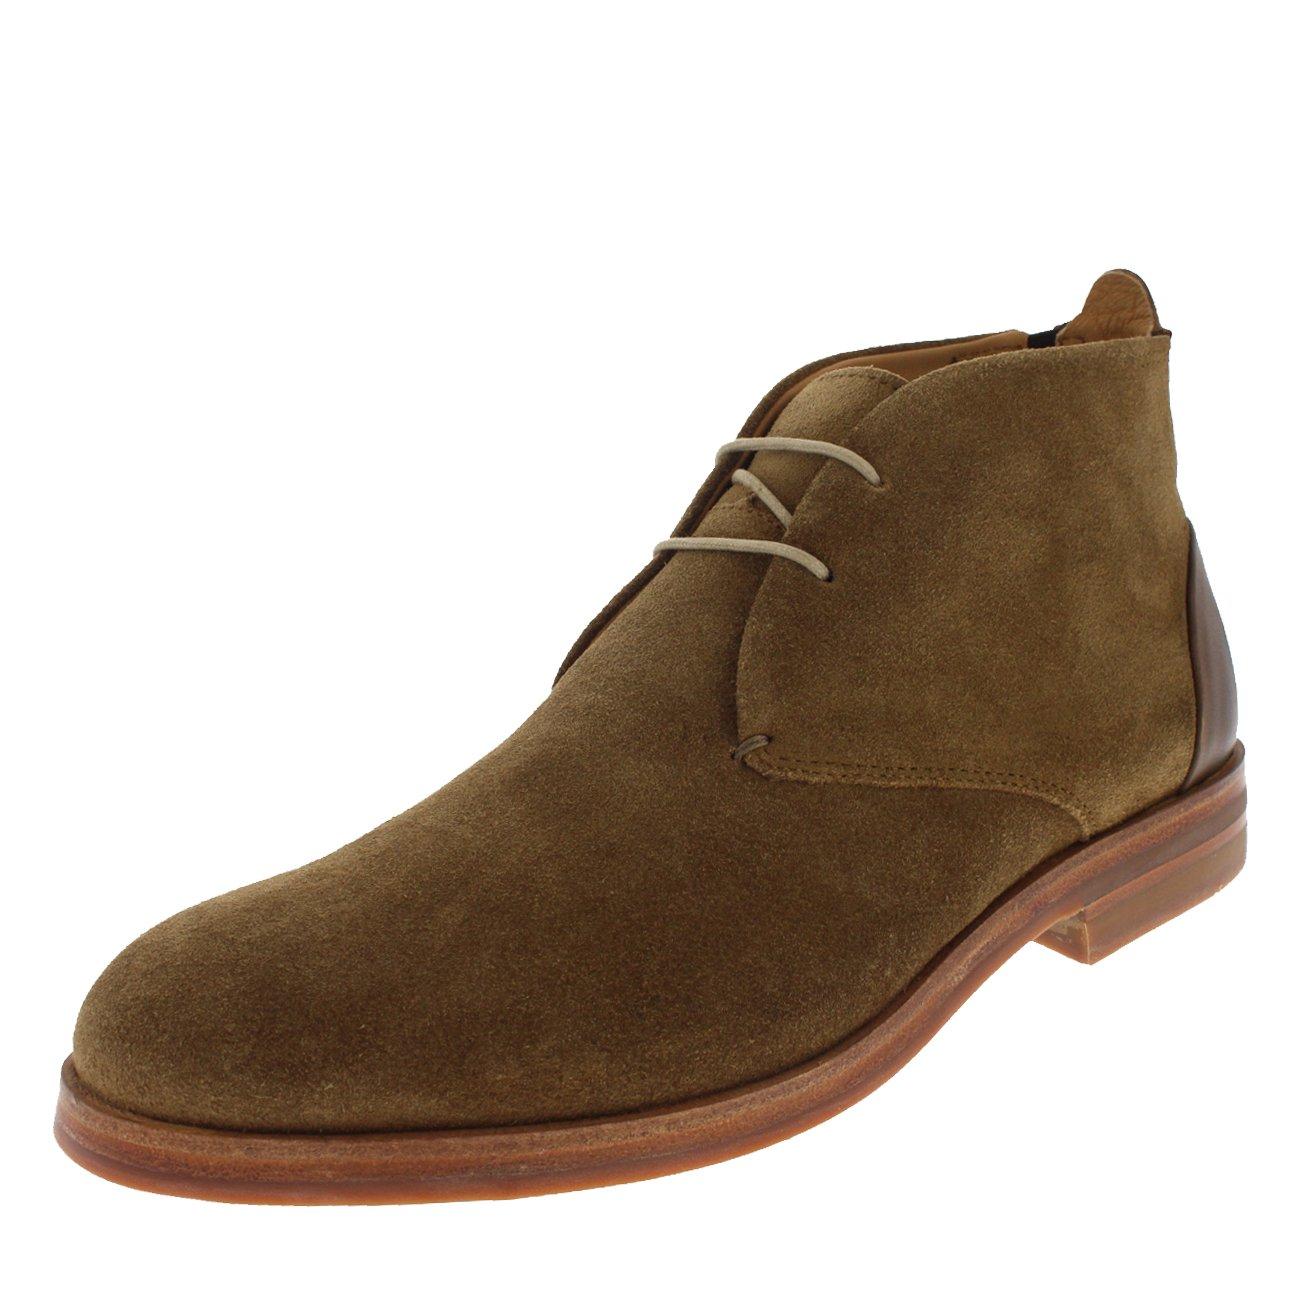 Hudson London Boots Herren Matteo Suede Chukka Boots London Tobacco 732194 e2ed123e2b